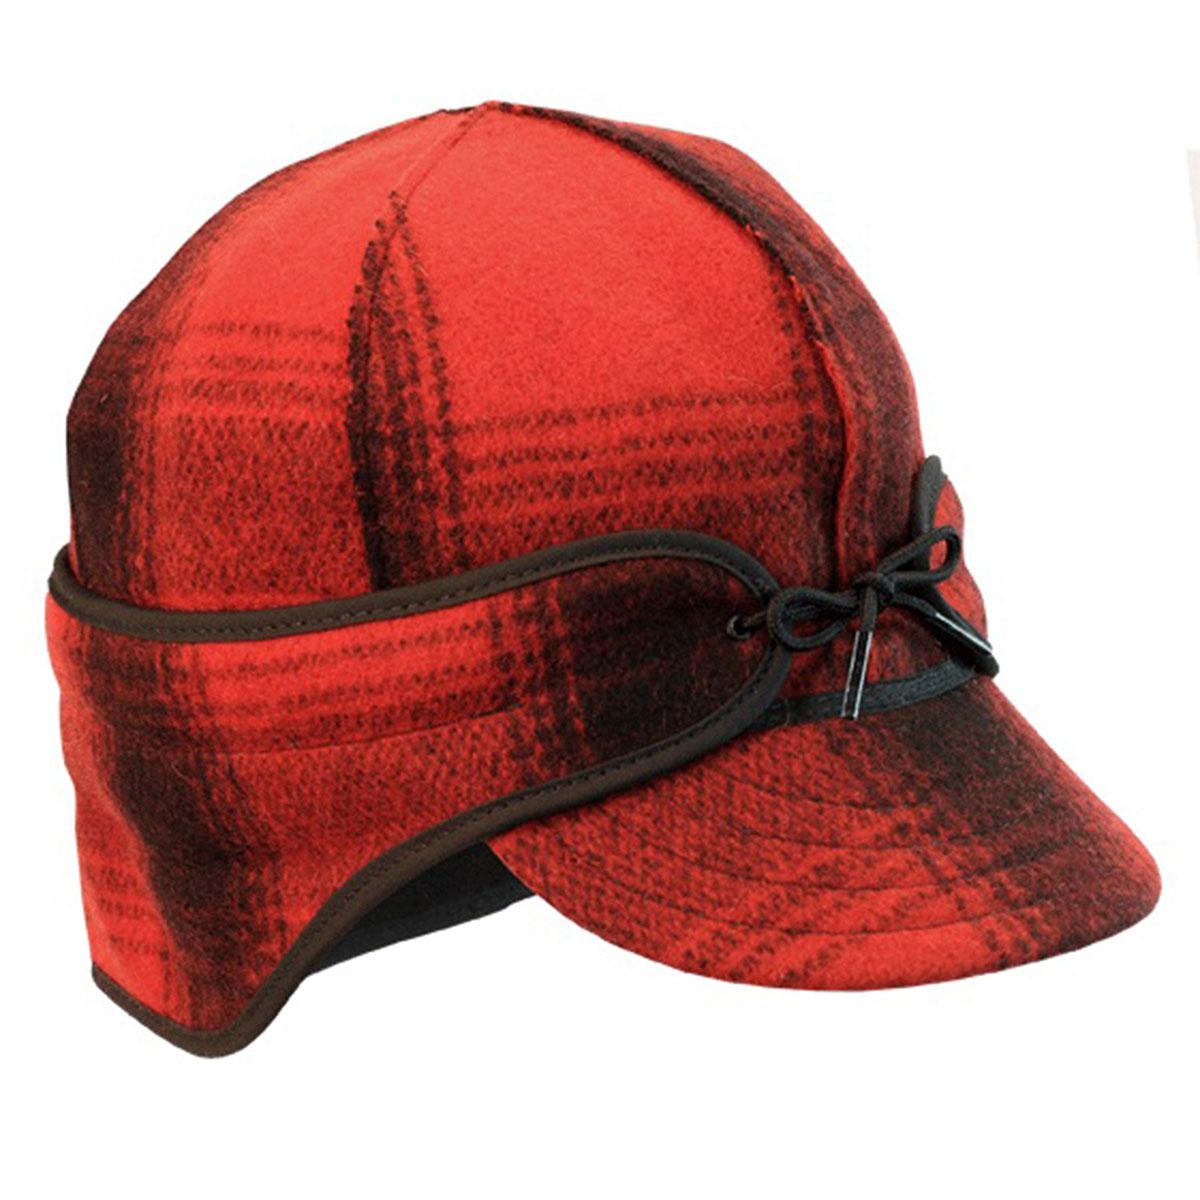 1930s Style Mens Hats Rancher Cap $49.99 AT vintagedancer.com